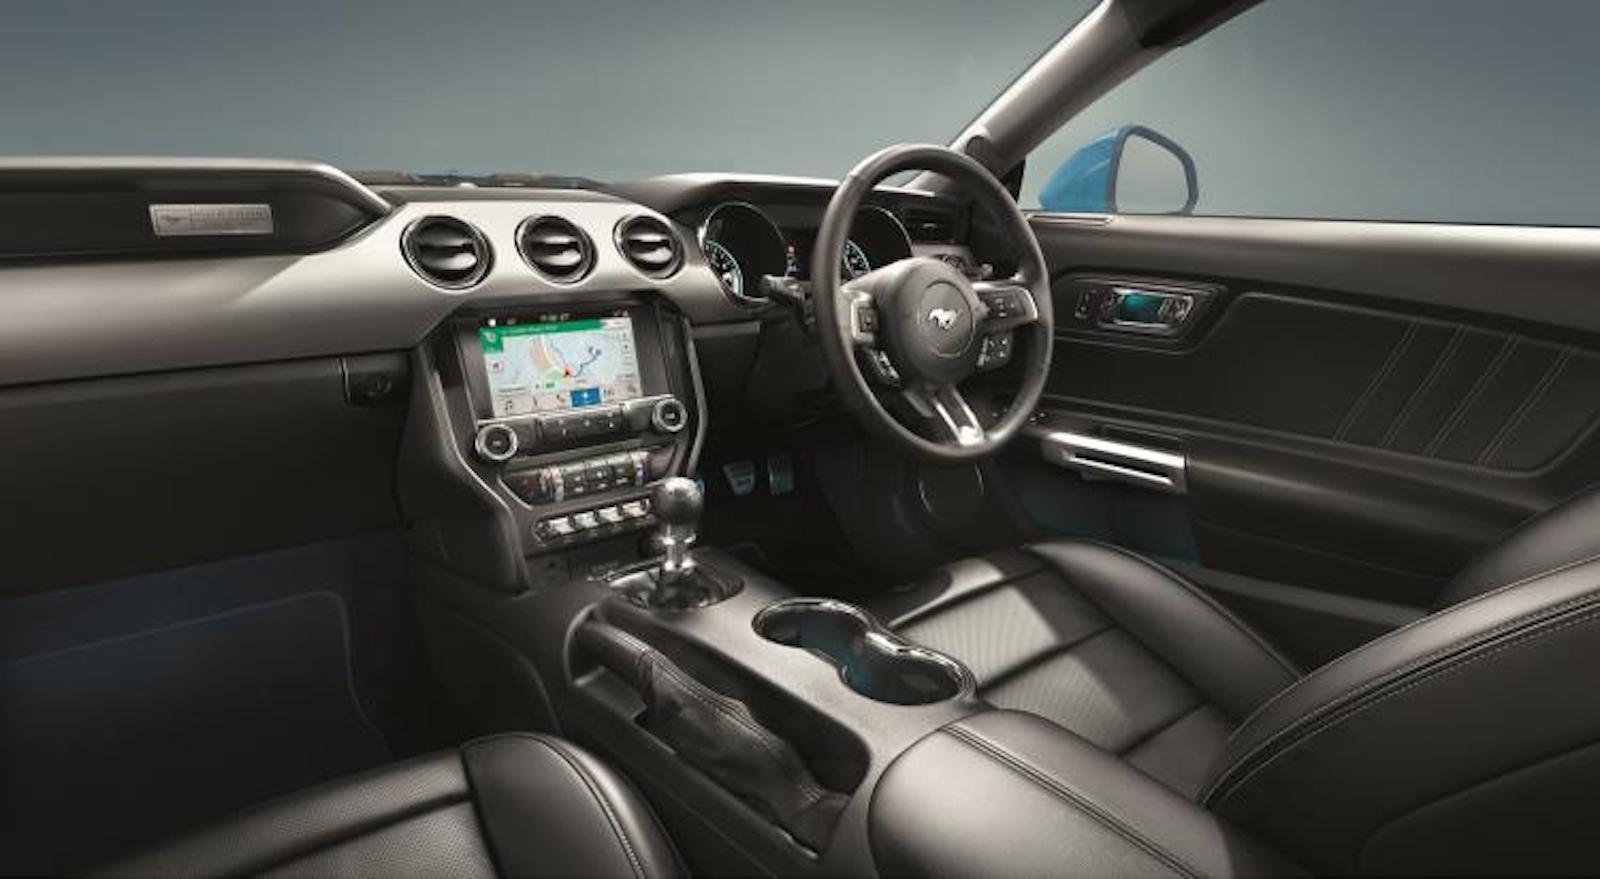 Ford Mustang Convertible - interior